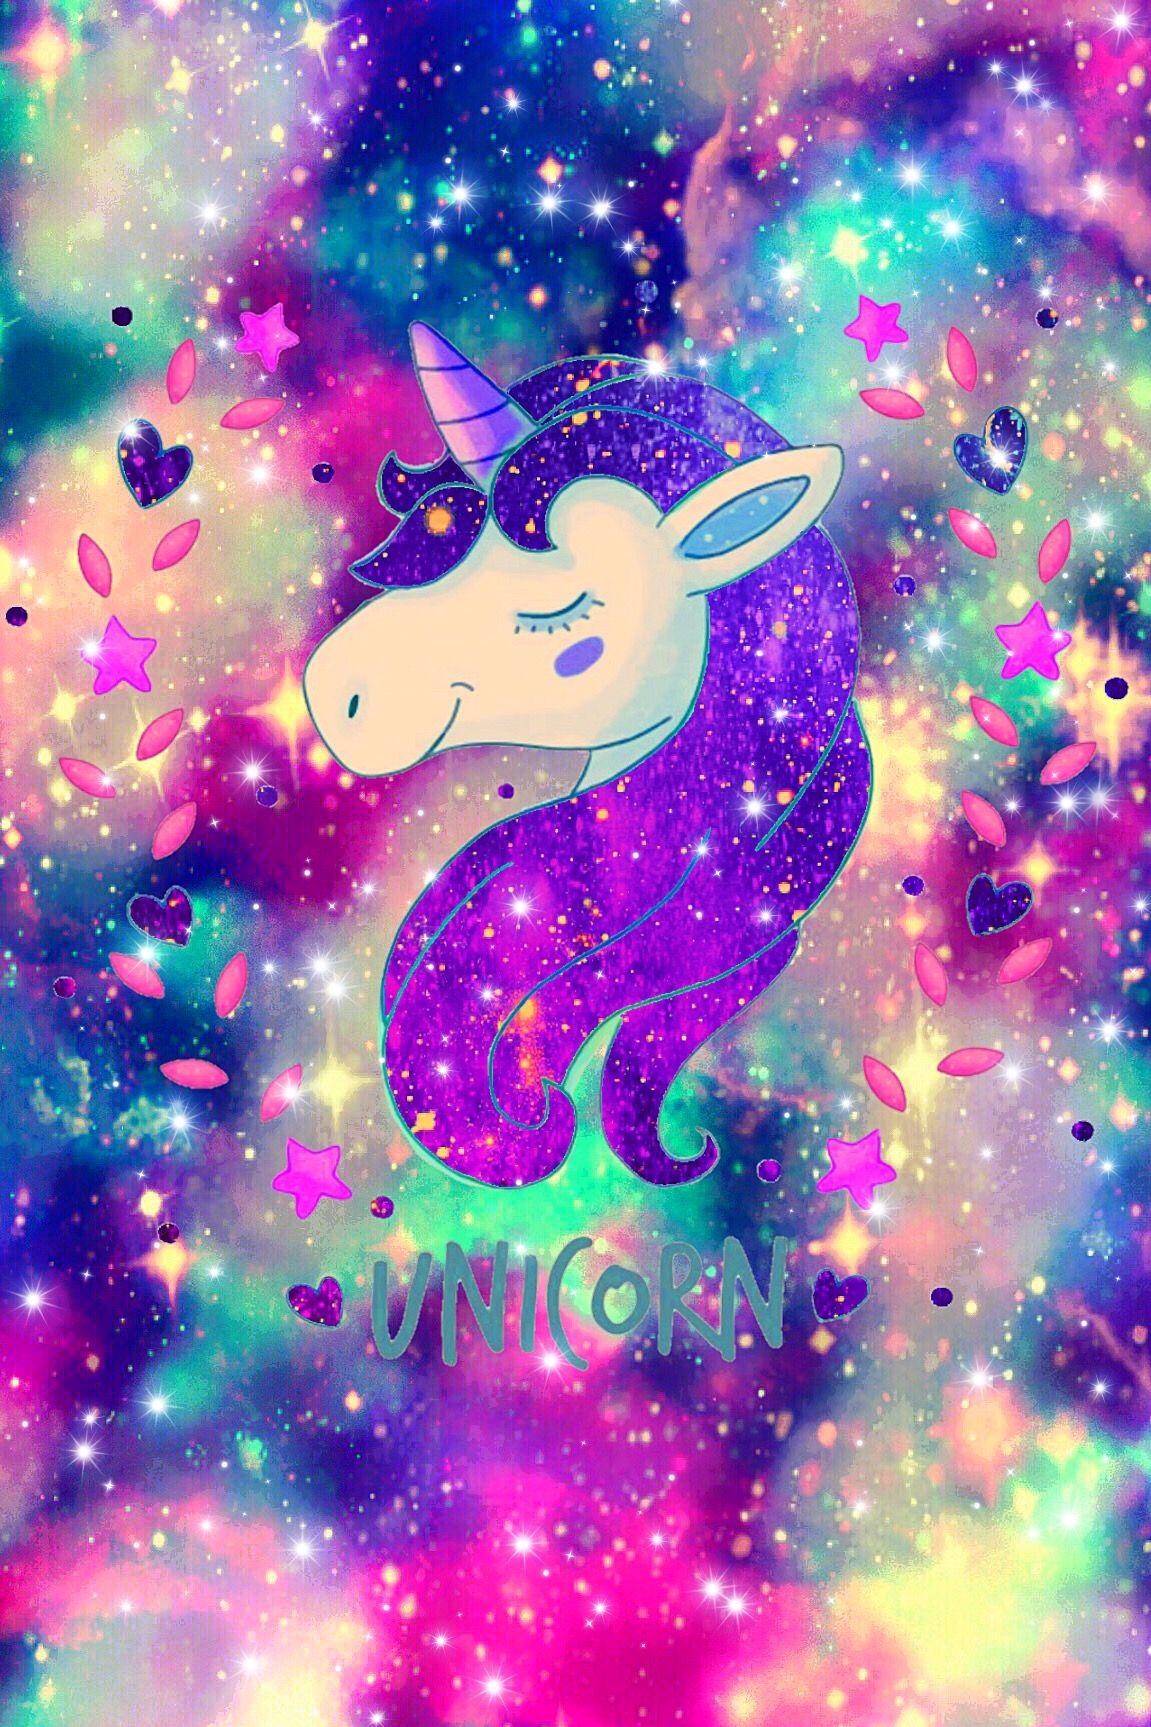 Shimmer Magical Unicorn Galaxy Wallpaper Androidwallpaper Iphonewallpaper Glitter Sparkle Galaxy Unicorn Magical Dream Night Sky Pics Art Unicornios Galaxy wallpaper glitter unicorns